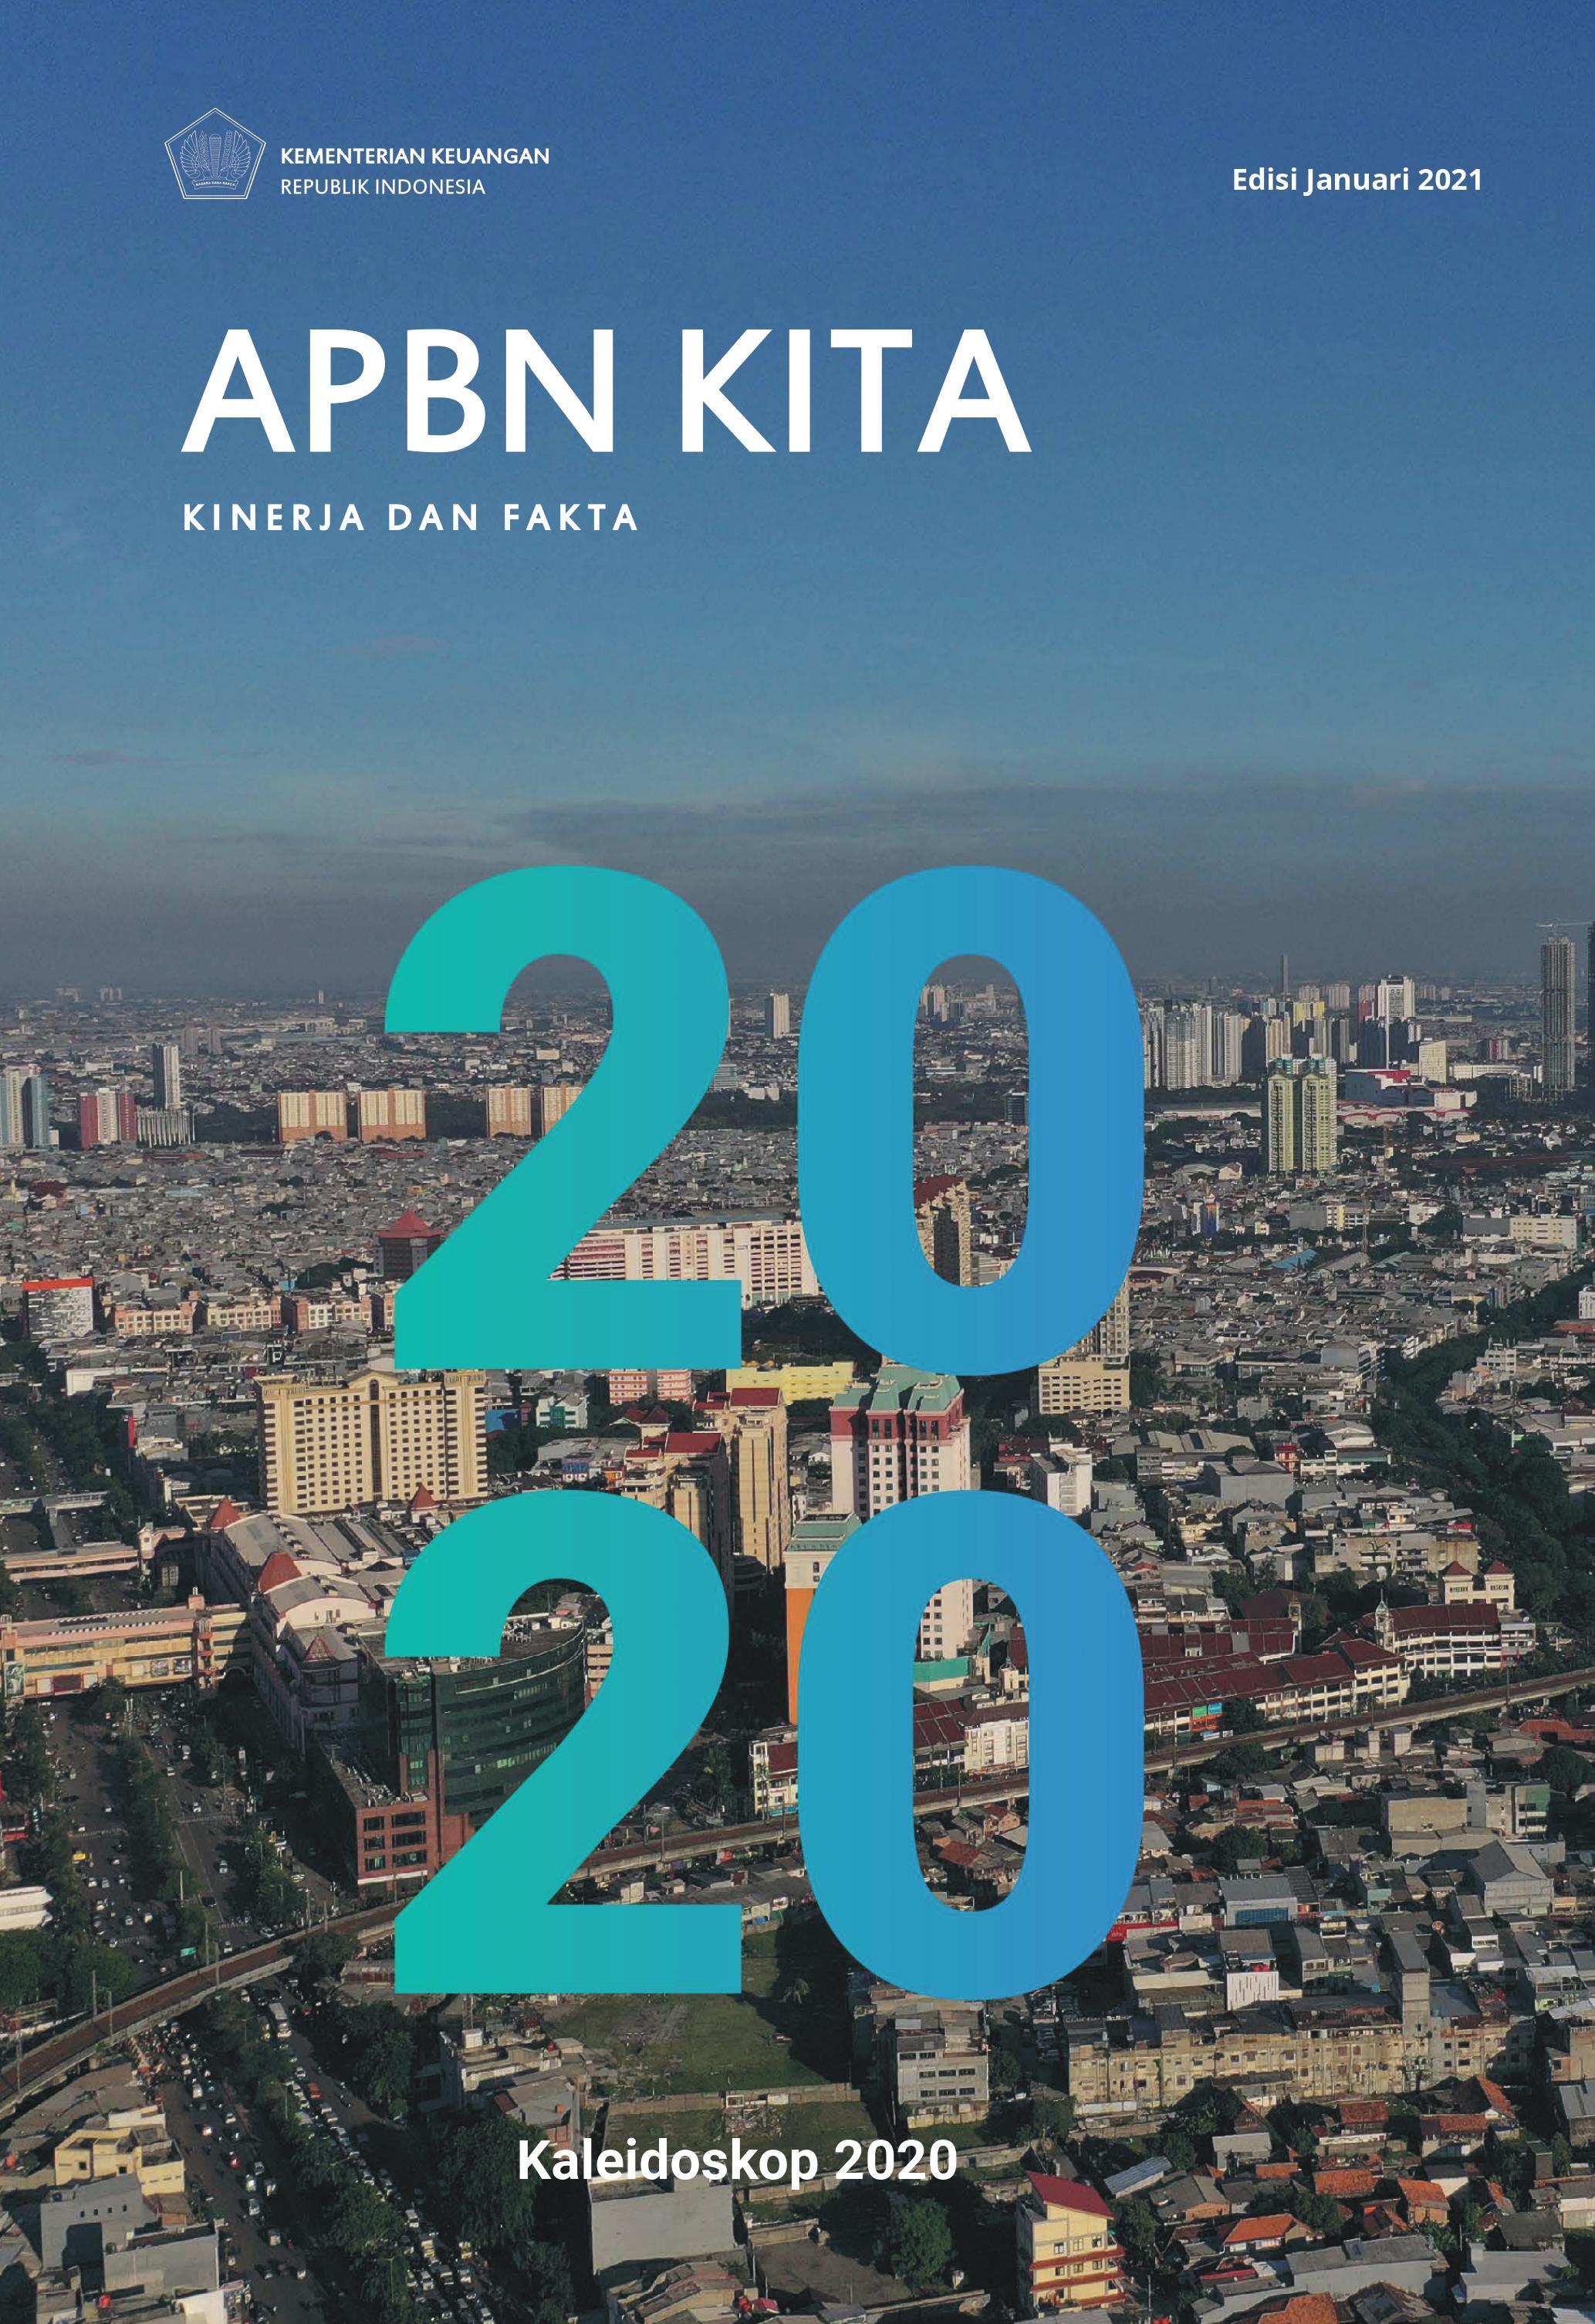 APBN KITA Edisi Januari 2021